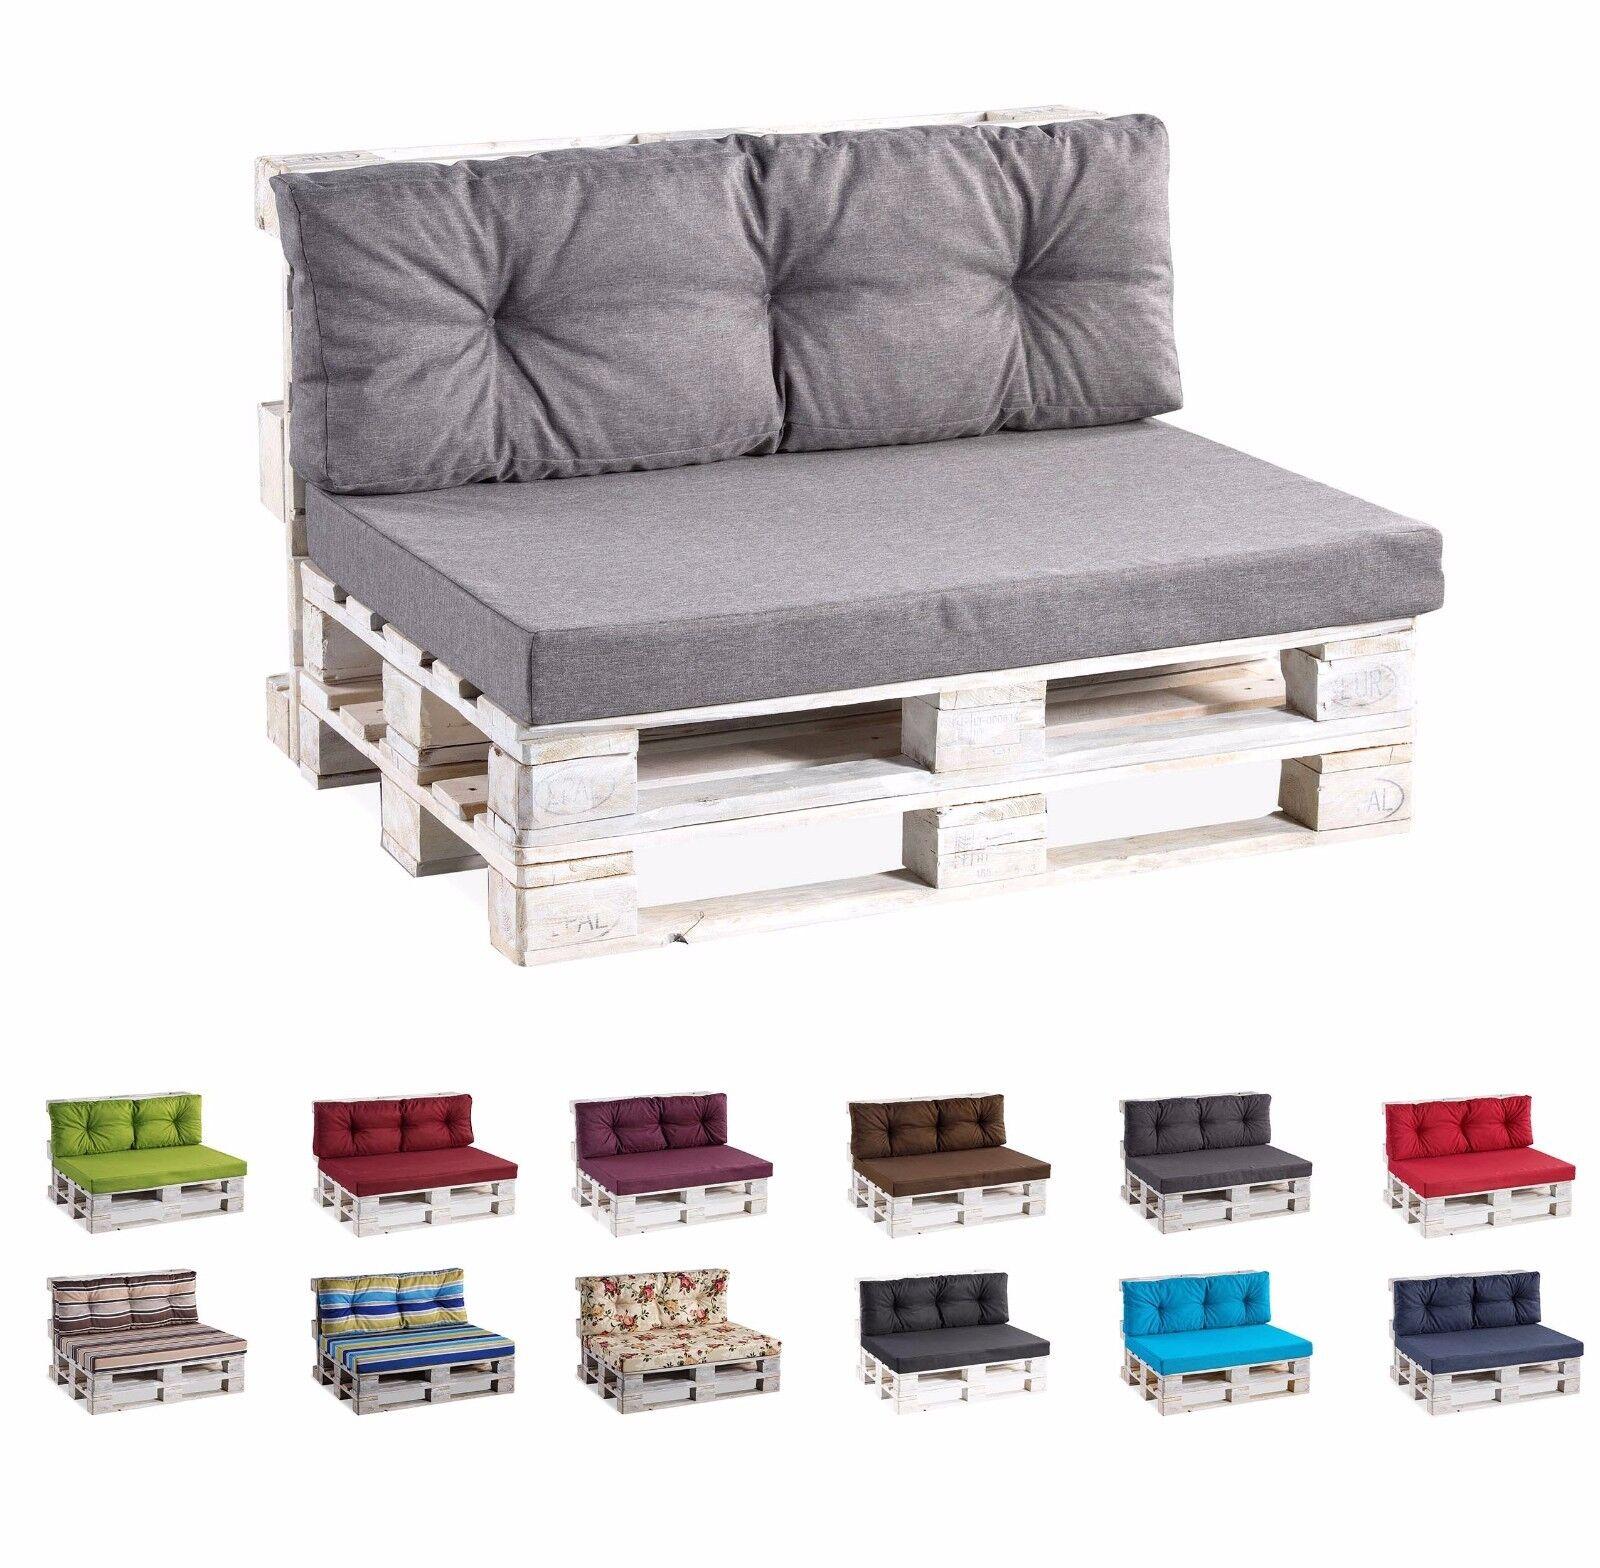 palettenkissen kaltschaum kissen palettensofa. Black Bedroom Furniture Sets. Home Design Ideas